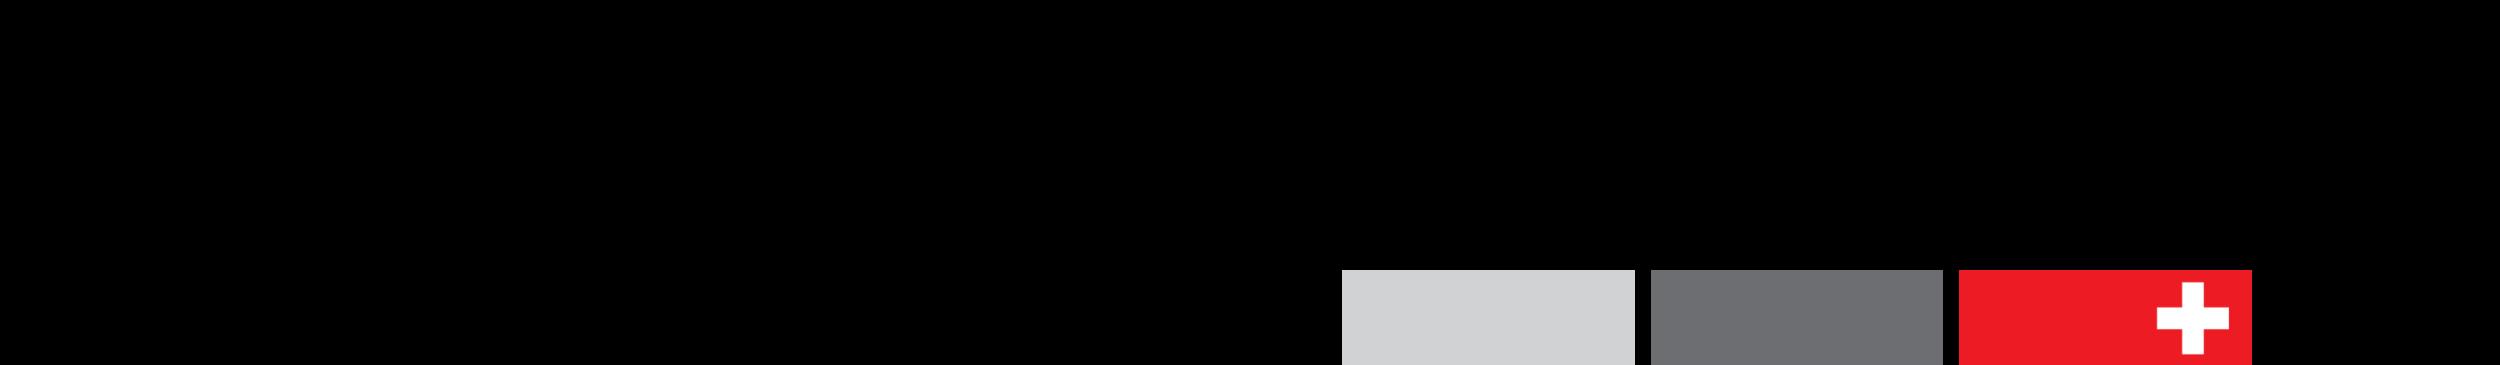 stromer-logo.png